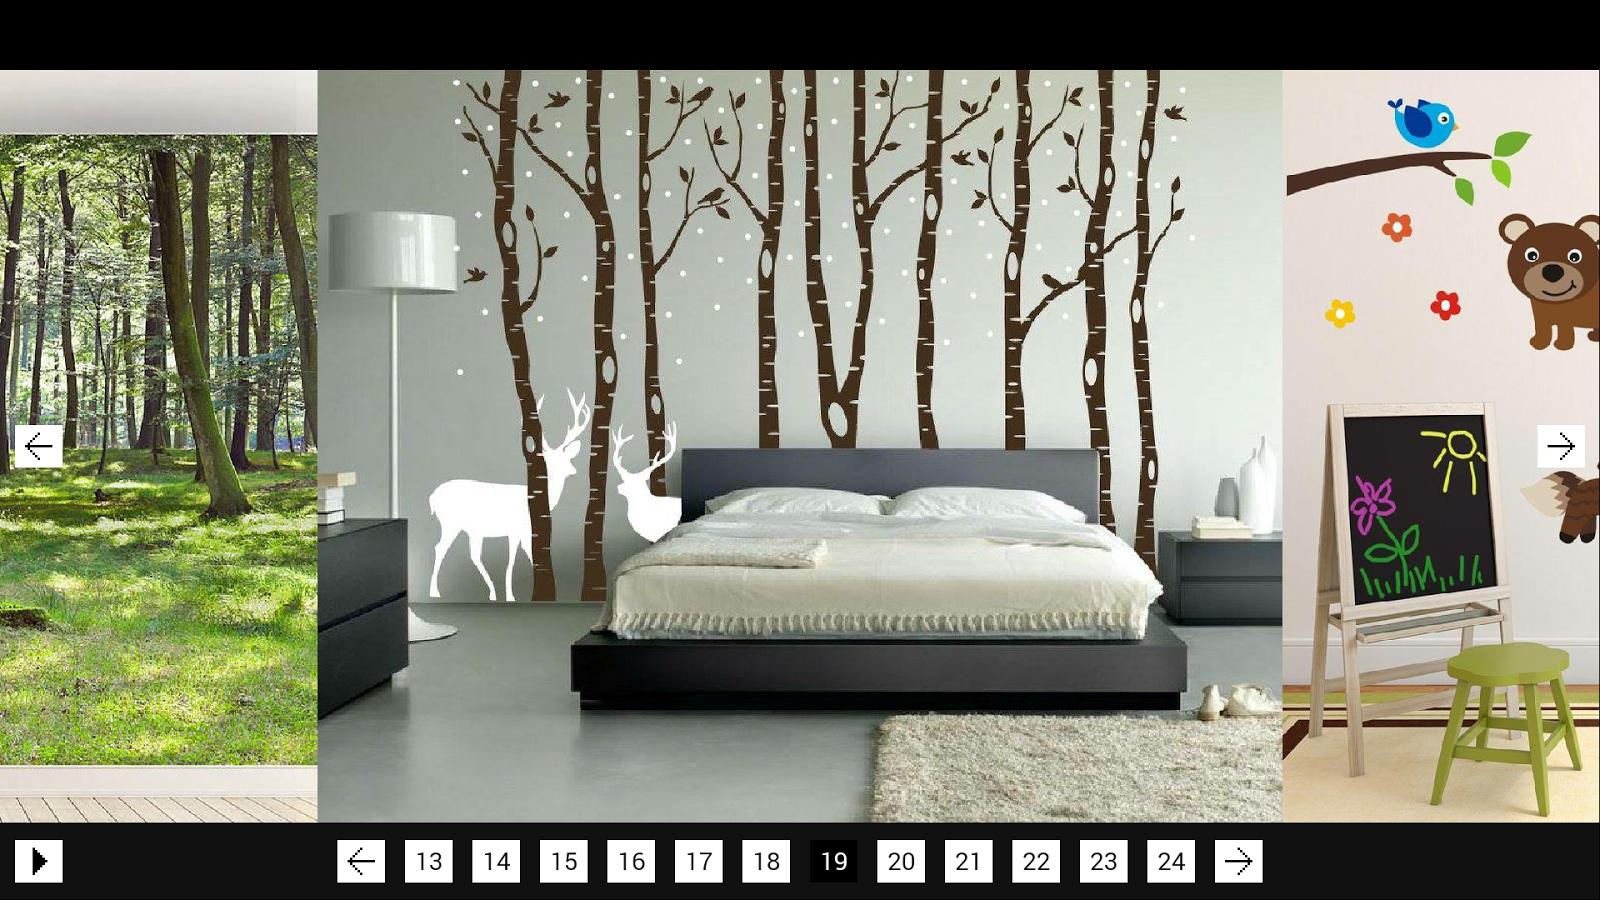 Wall art decor android apps on google play - Idee deco wallpaper volwassene kamer ...